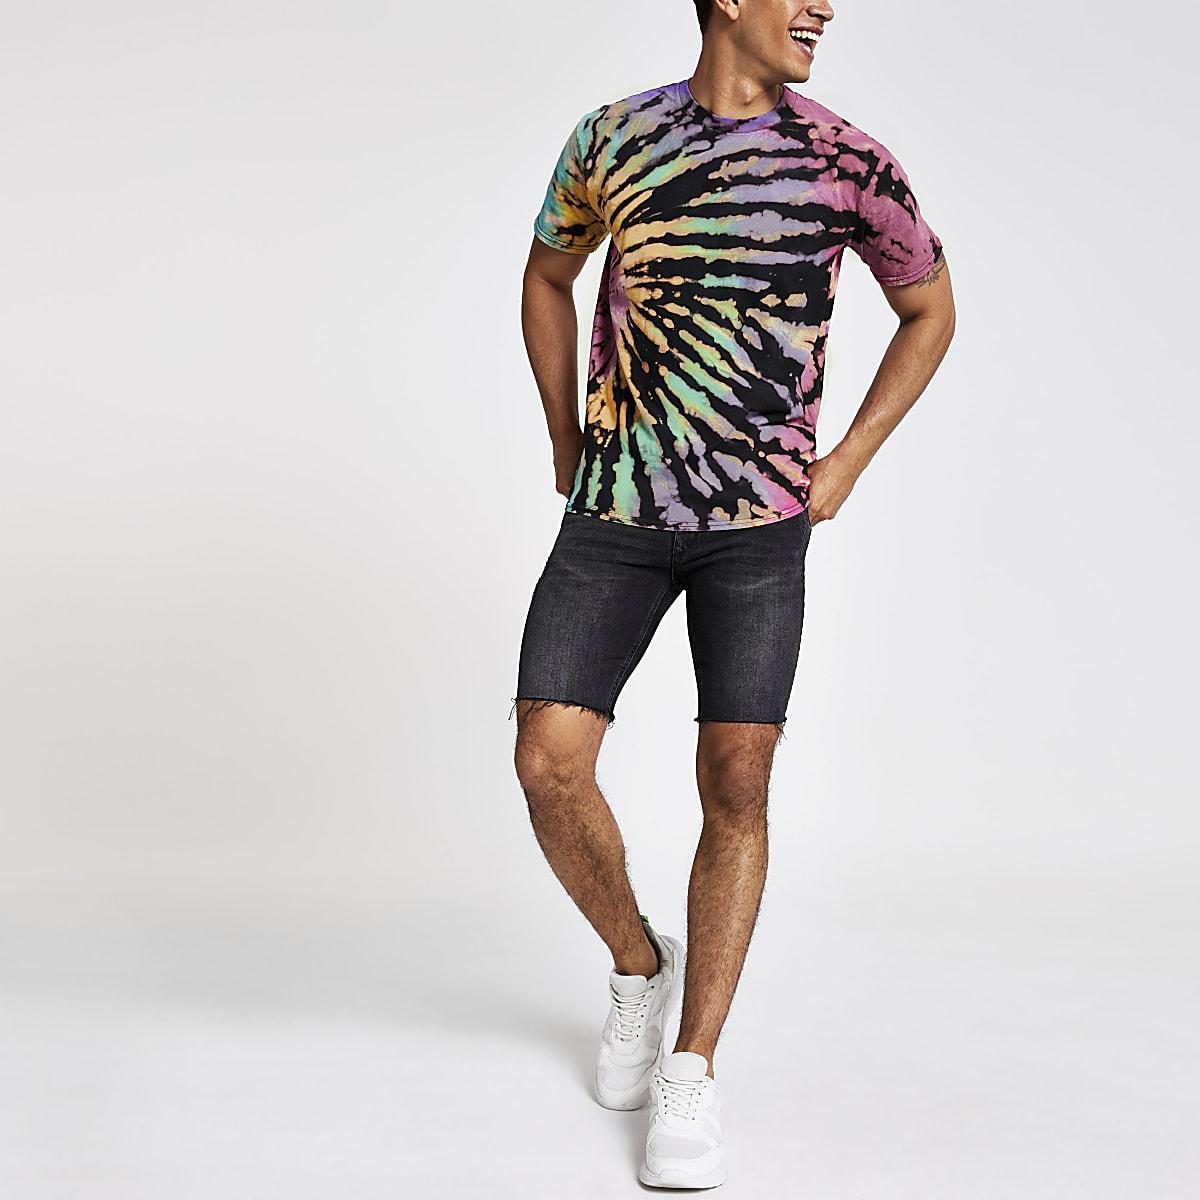 Schwarzes T-Shirt in mehrfarbiger Batik-Optik